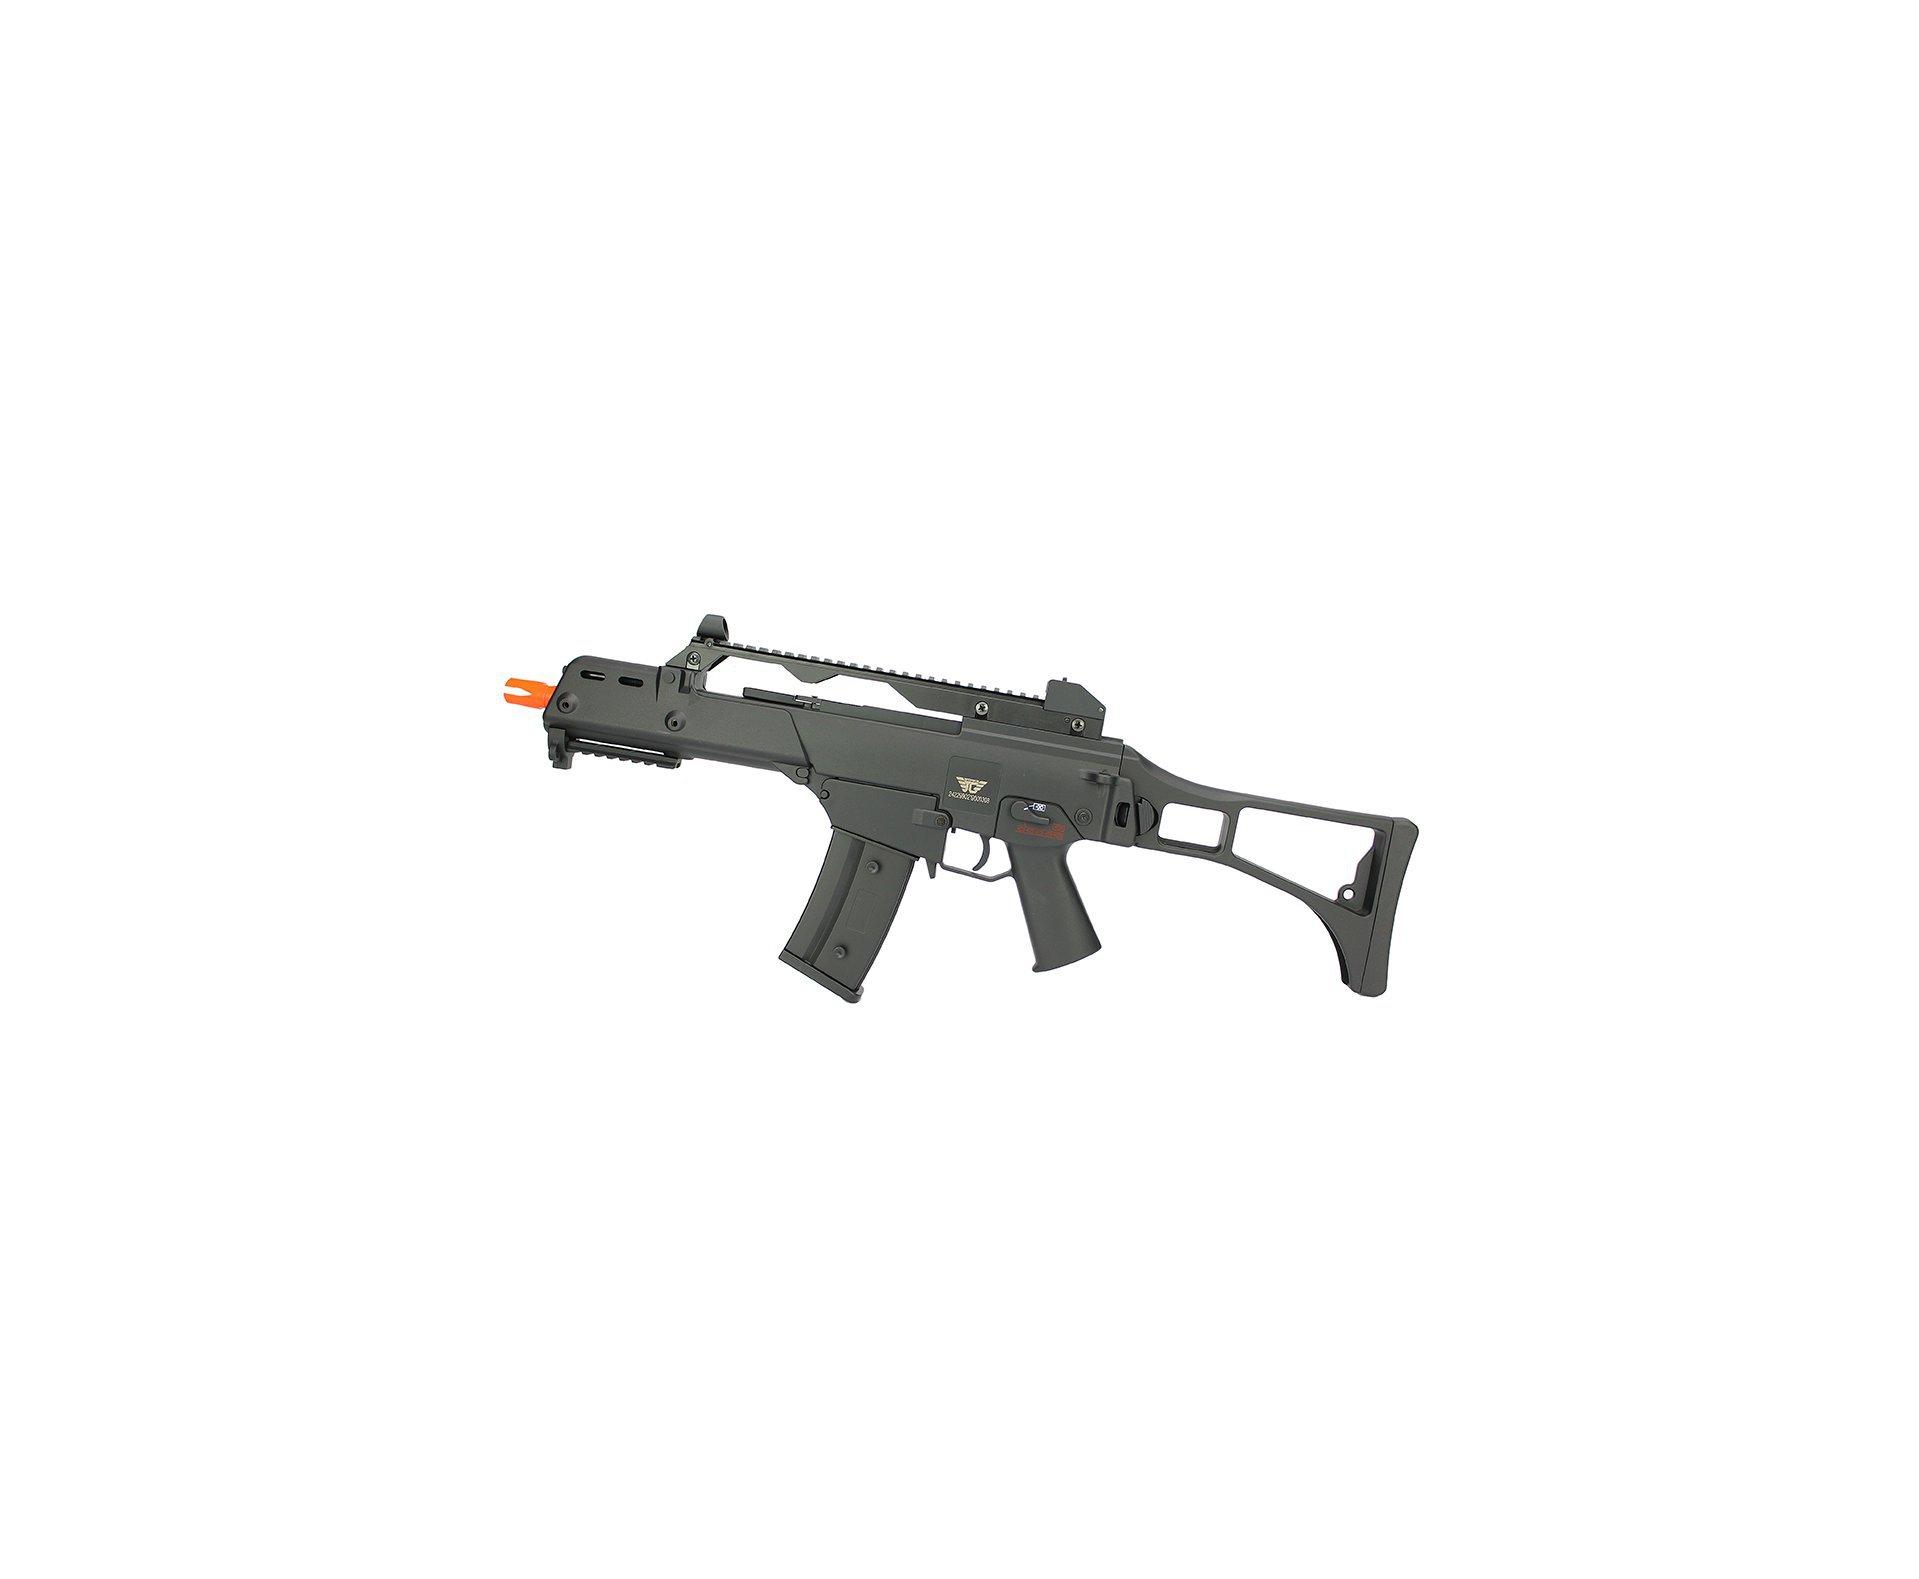 Rifle De Airsoft Aeg G36 Cal 6mm G608-0638 Jing Gong + Capa Simples + 2x Bbs Raptor 0,28g 2000uni